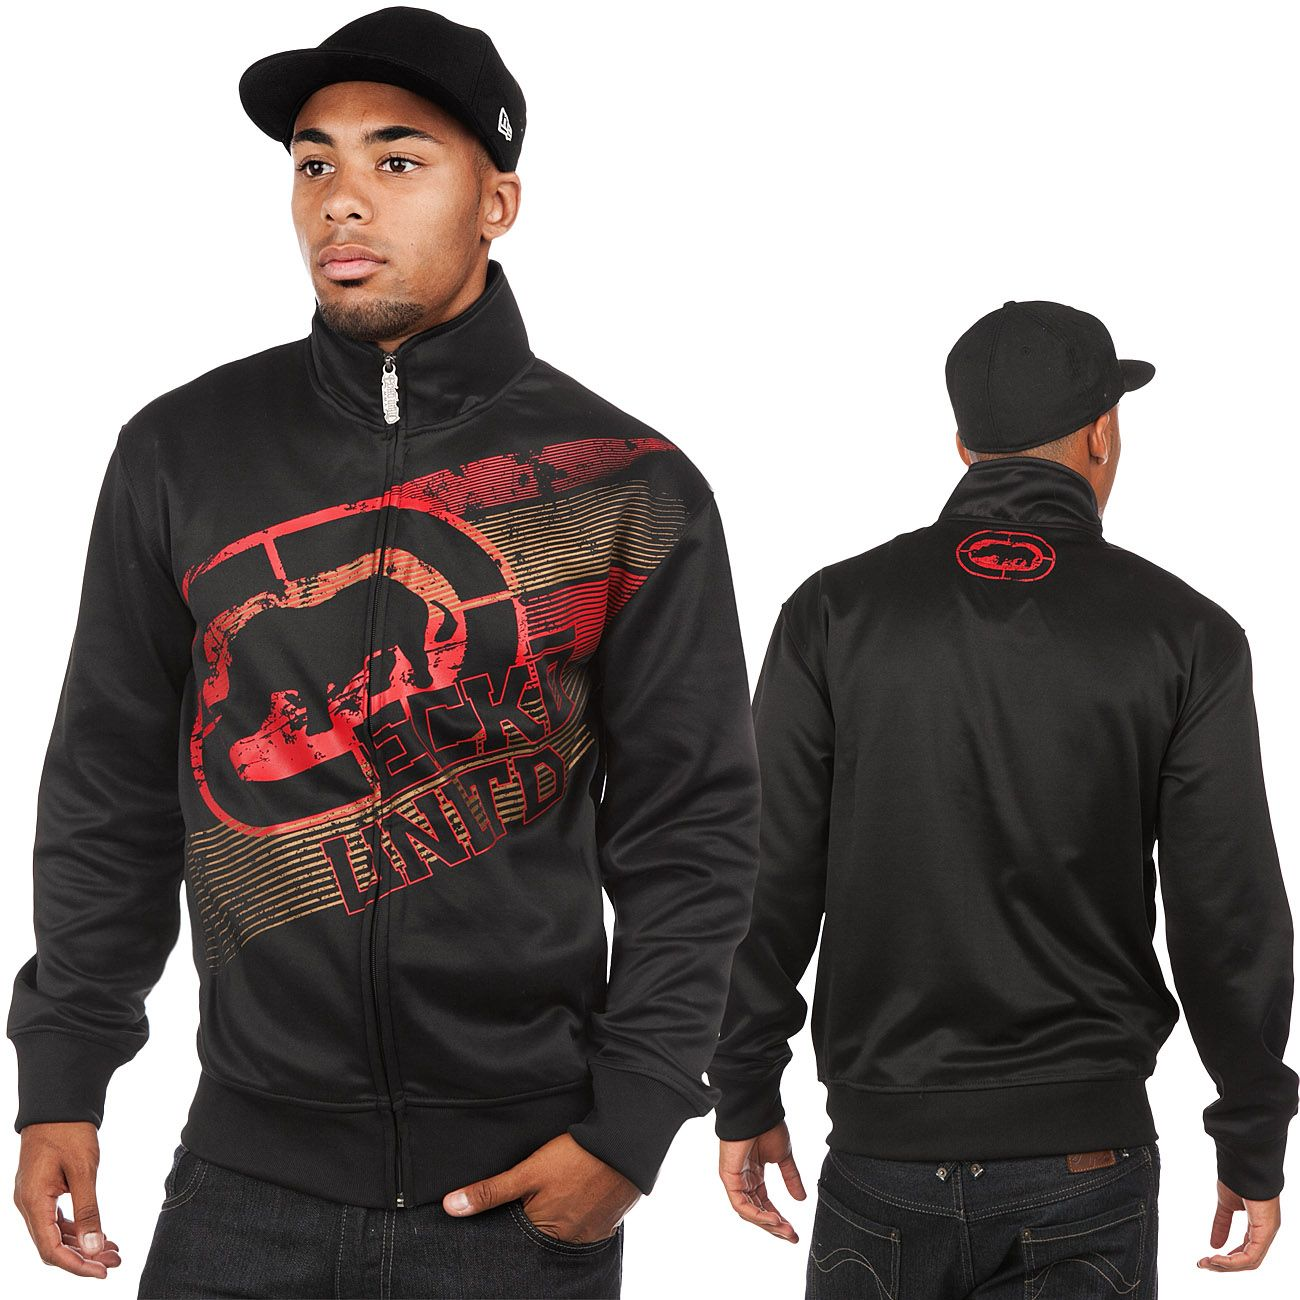 ecko unltd mma overhand track jacket real black �75